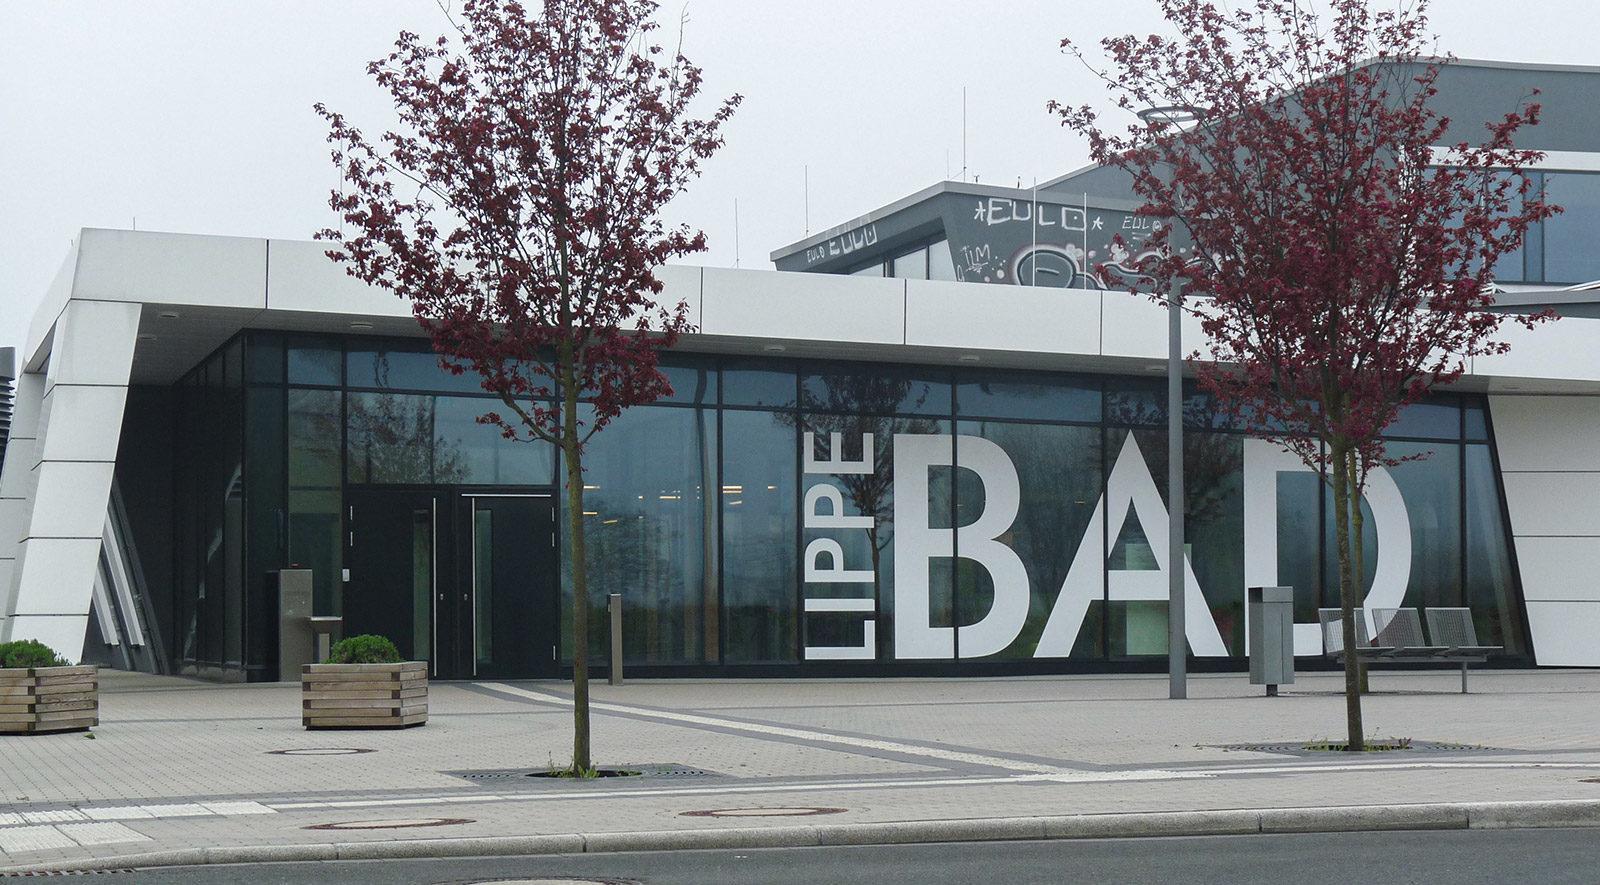 Lippe Bad